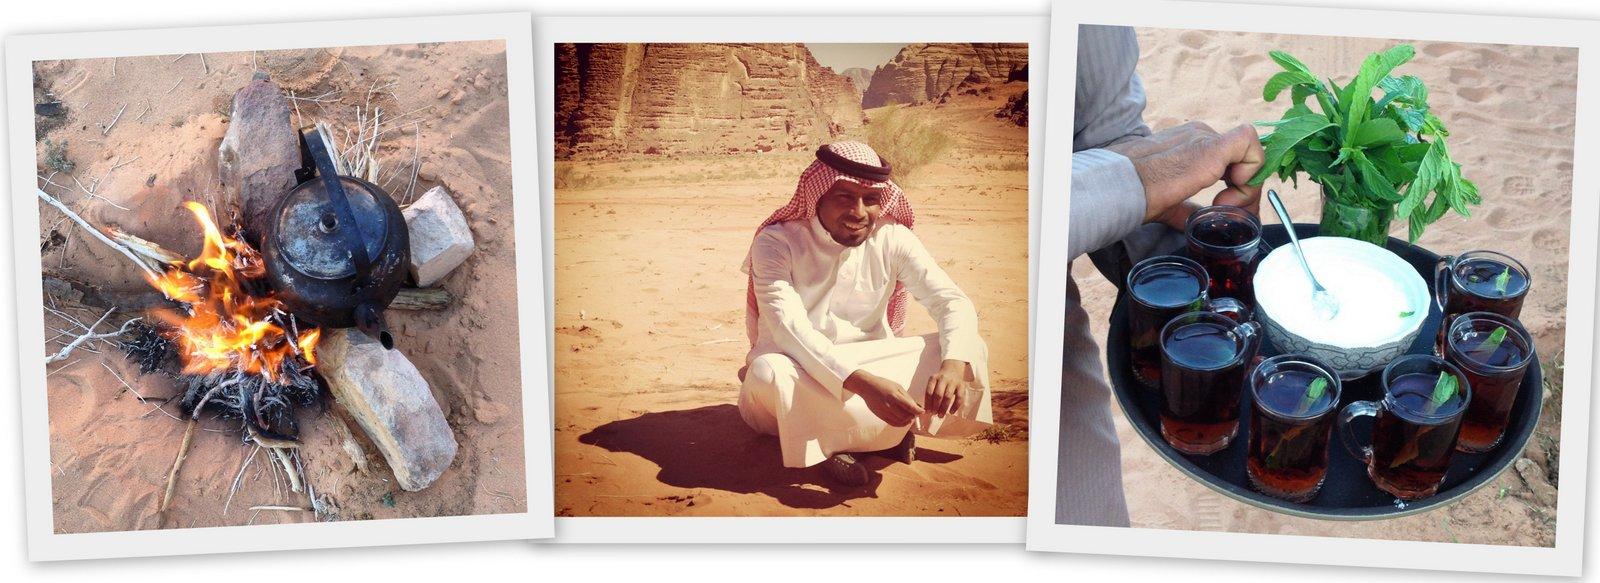 jordania el desierto wadi rum